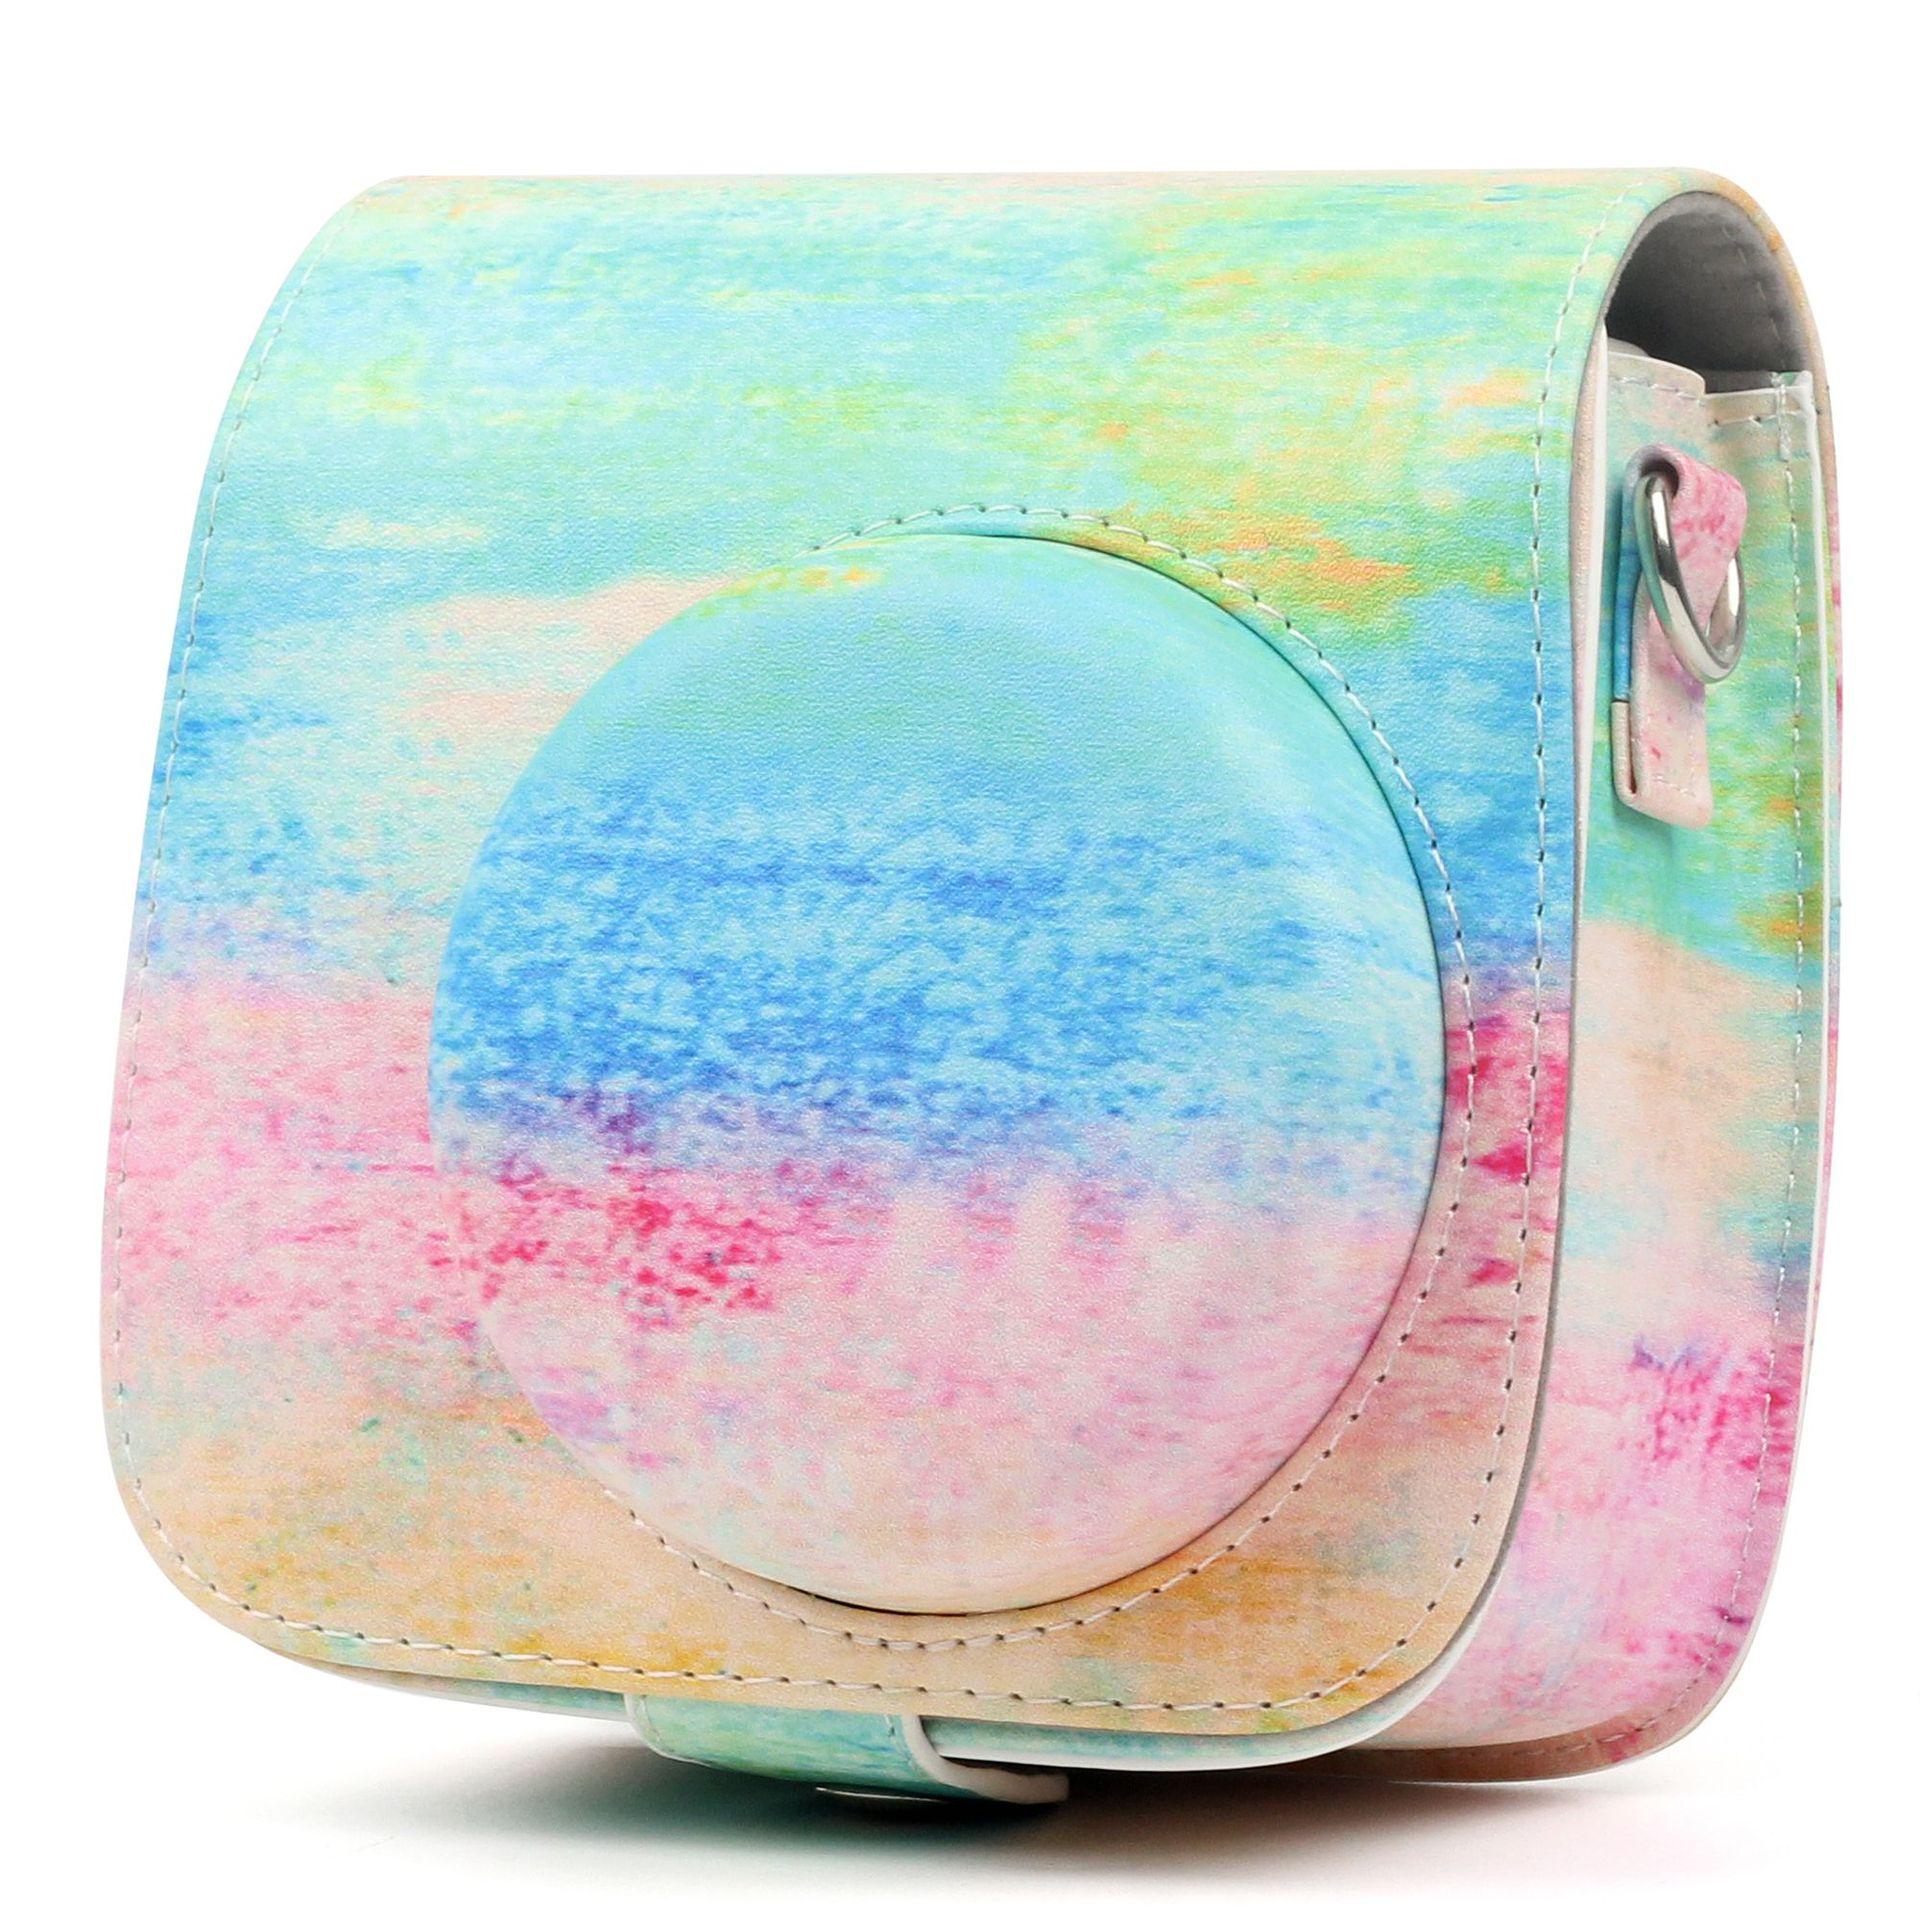 Fujifilm Instax Mini 9 8 8 + аксессуар для камеры Художественная масляная краска искусственная кожа мгновенная камера защитная сумка на плечо Чехол